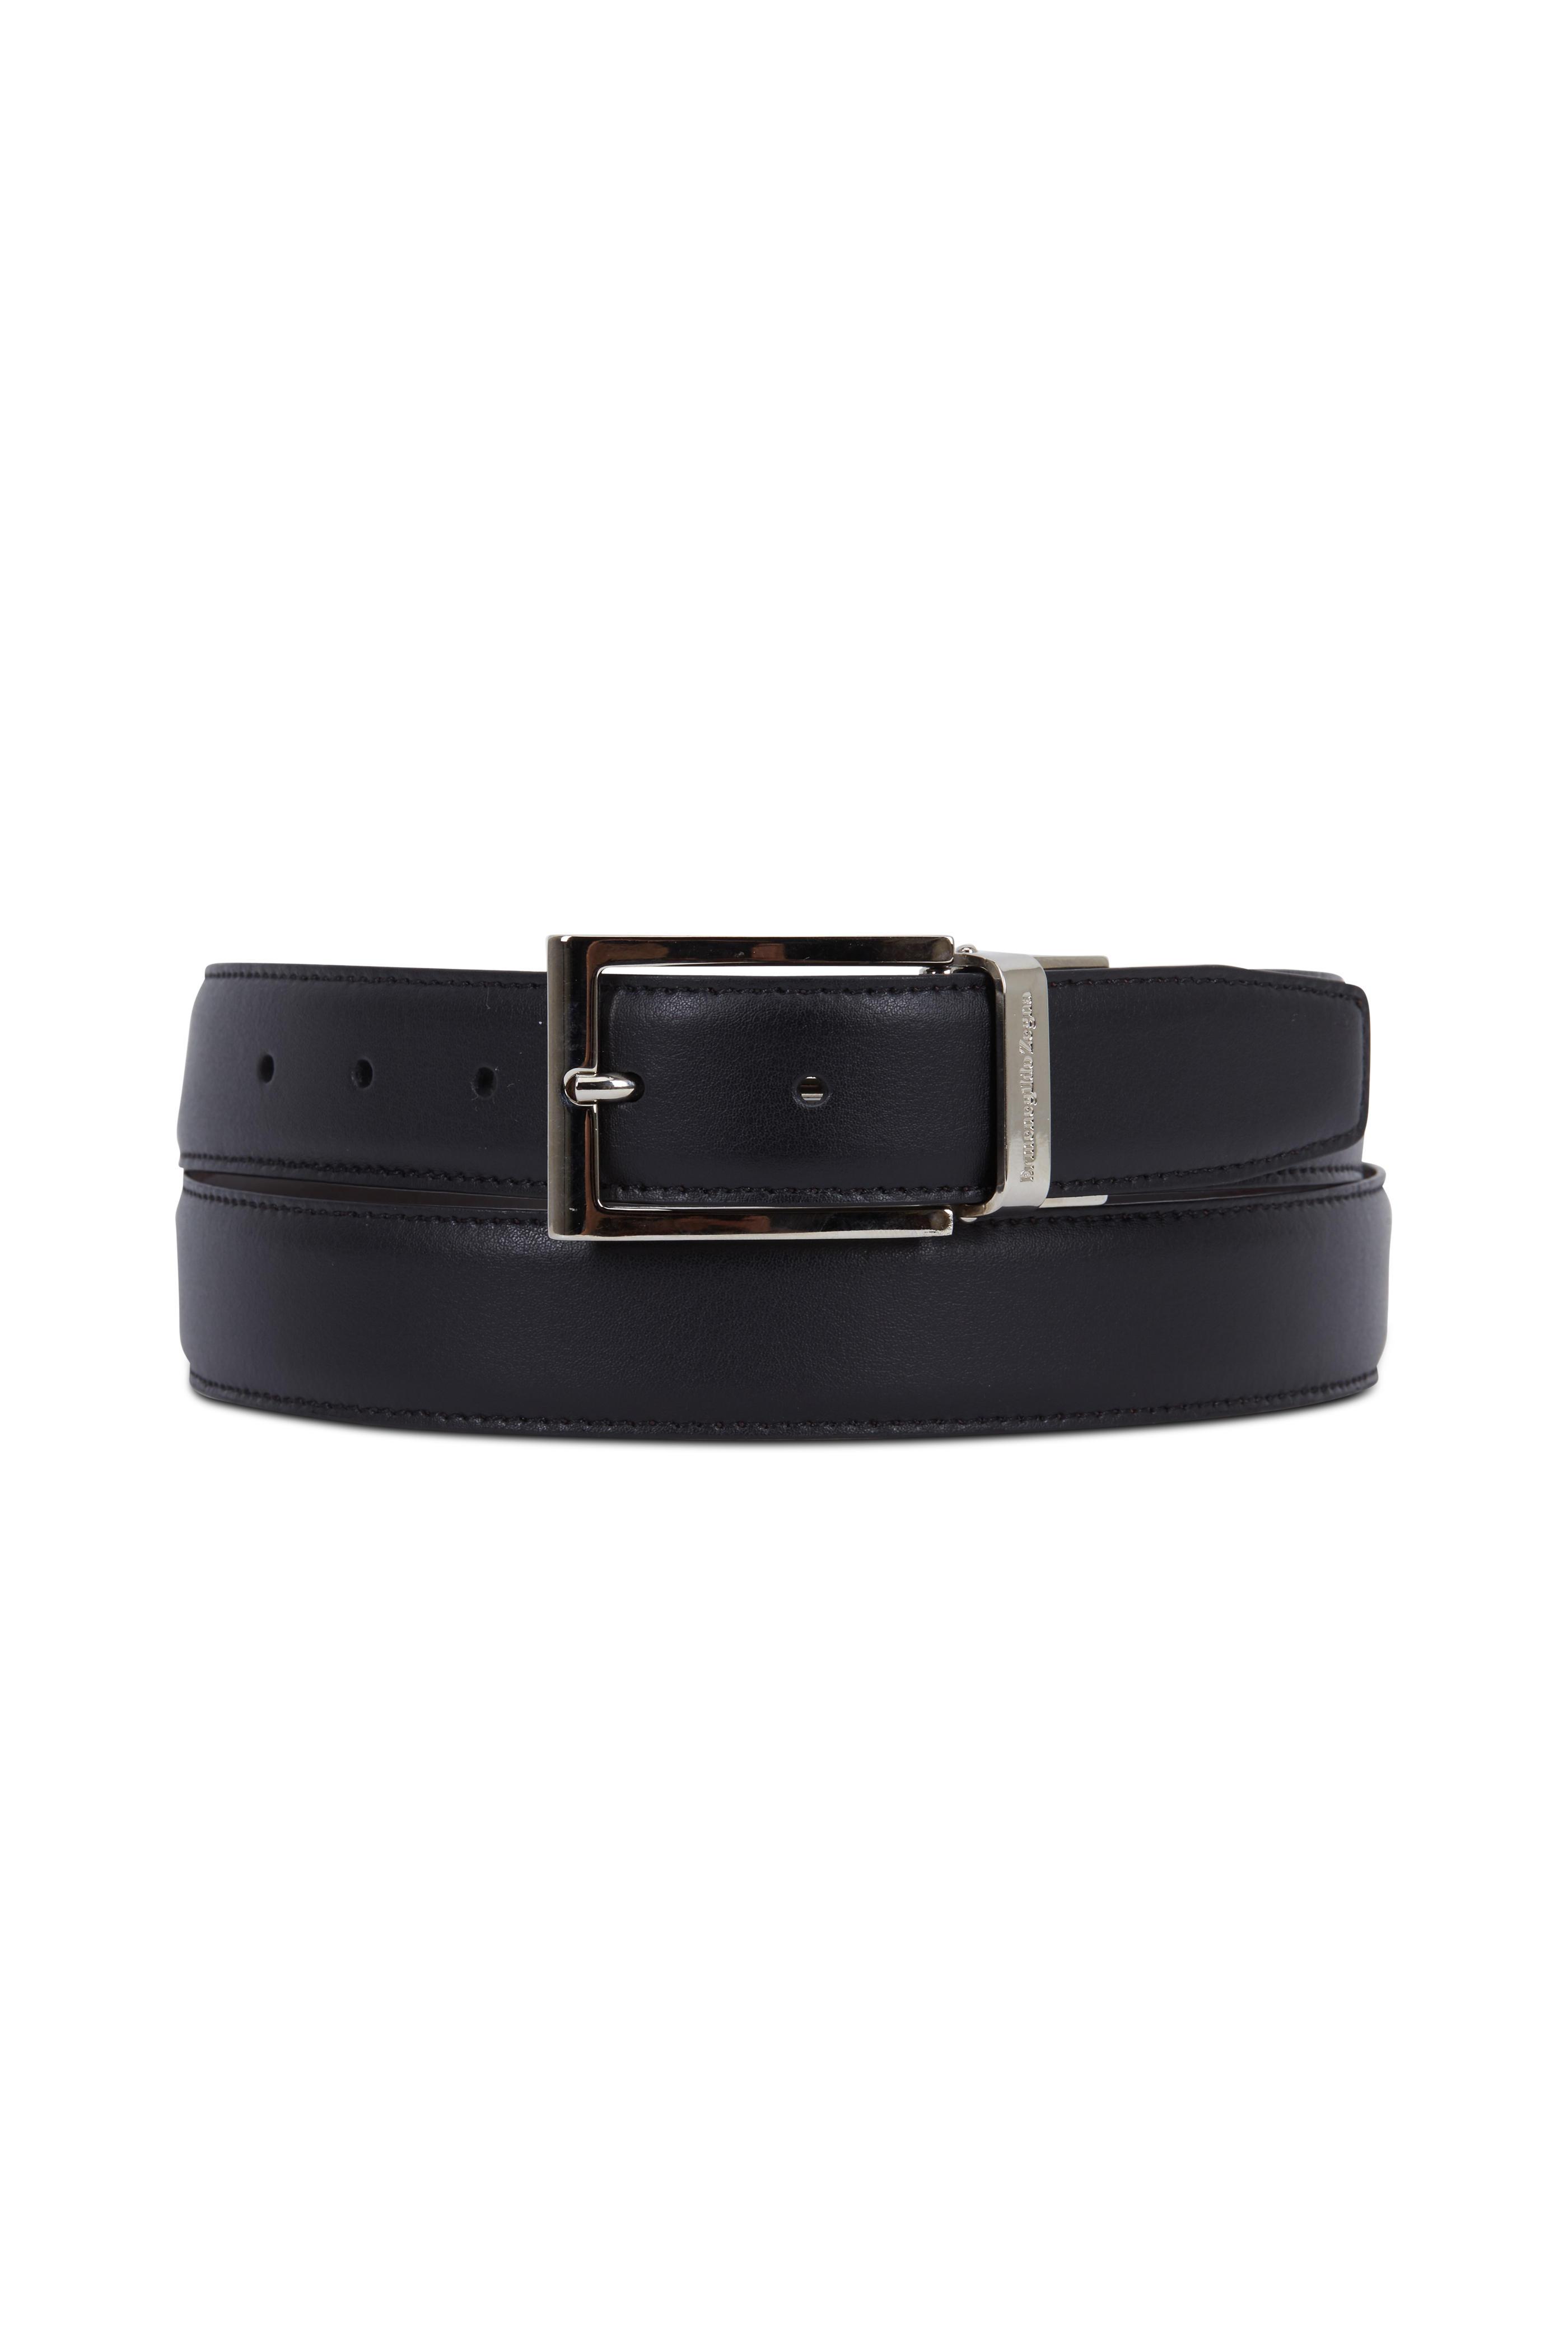 5ac5b83d03 Ermenegildo Zegna - Dark Brown & Black Leather Reversible Belt ...